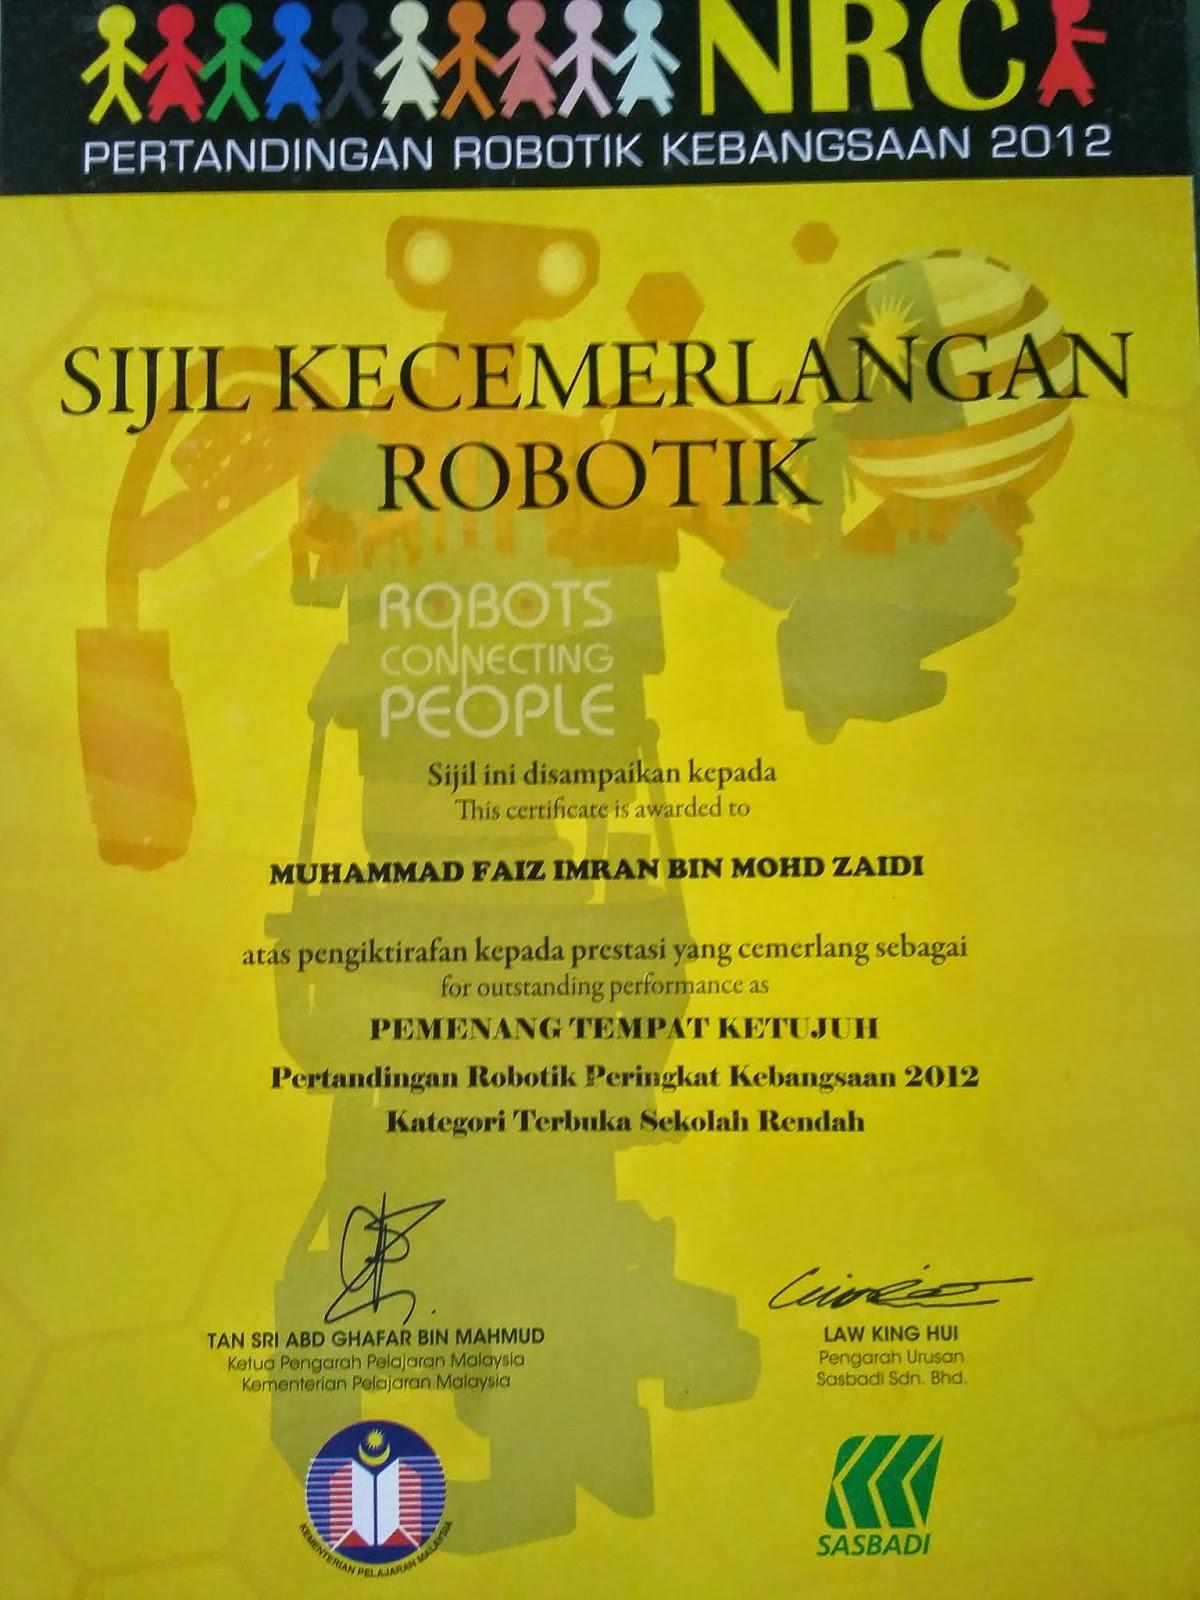 Rekaan Robotik peringkat negeri kedah, adkddayah, sk bakar arang, robot, new robot, faiz imran